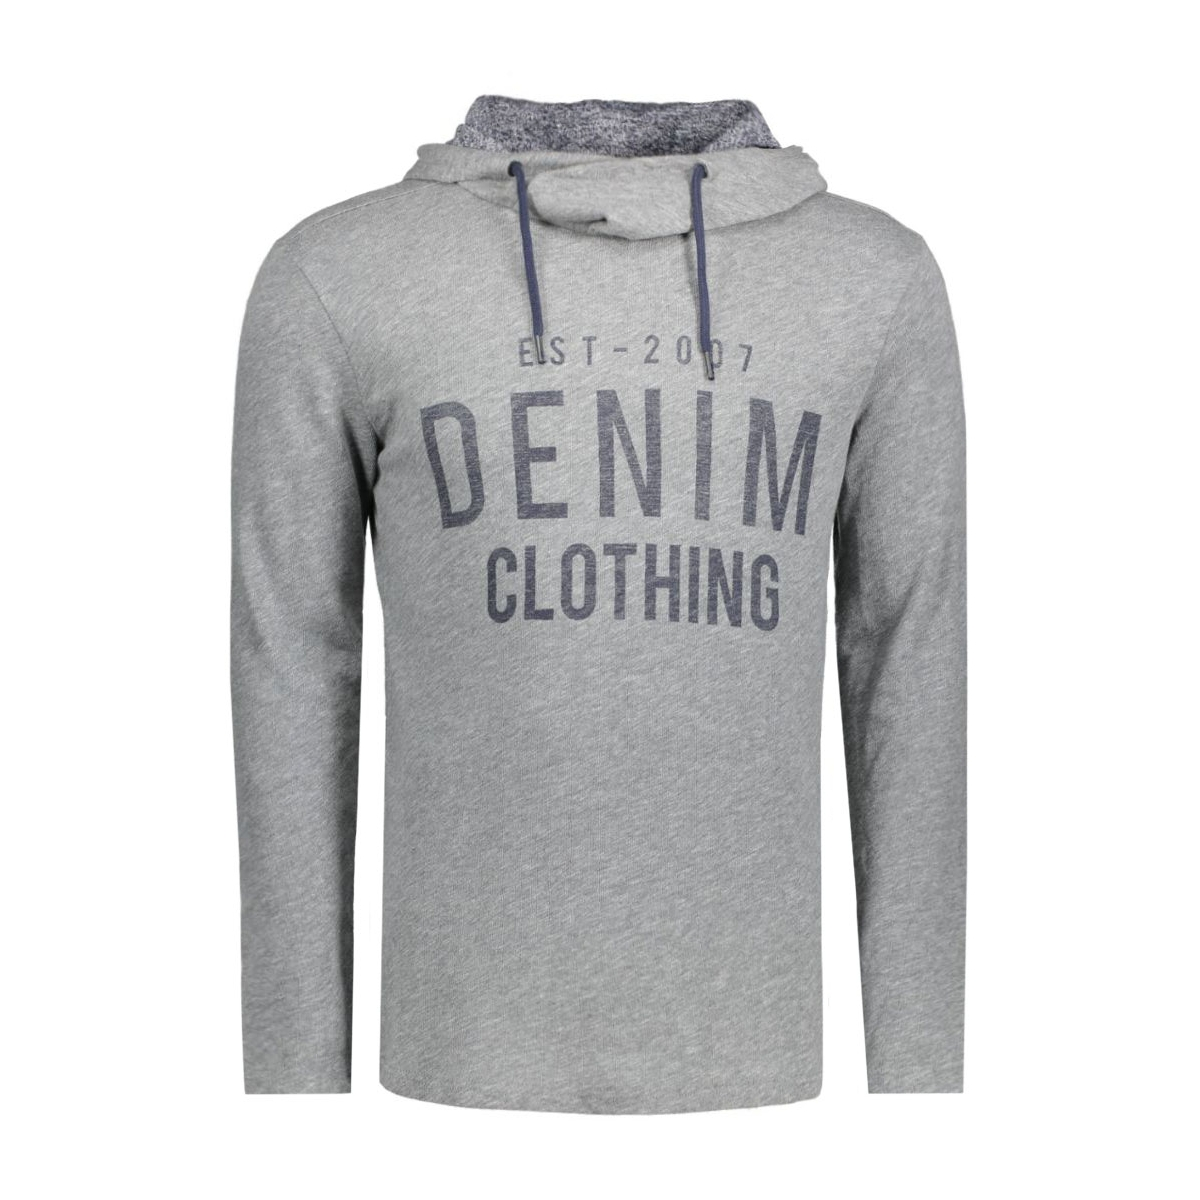 1036354.00.12 tom tailor sweater 2803